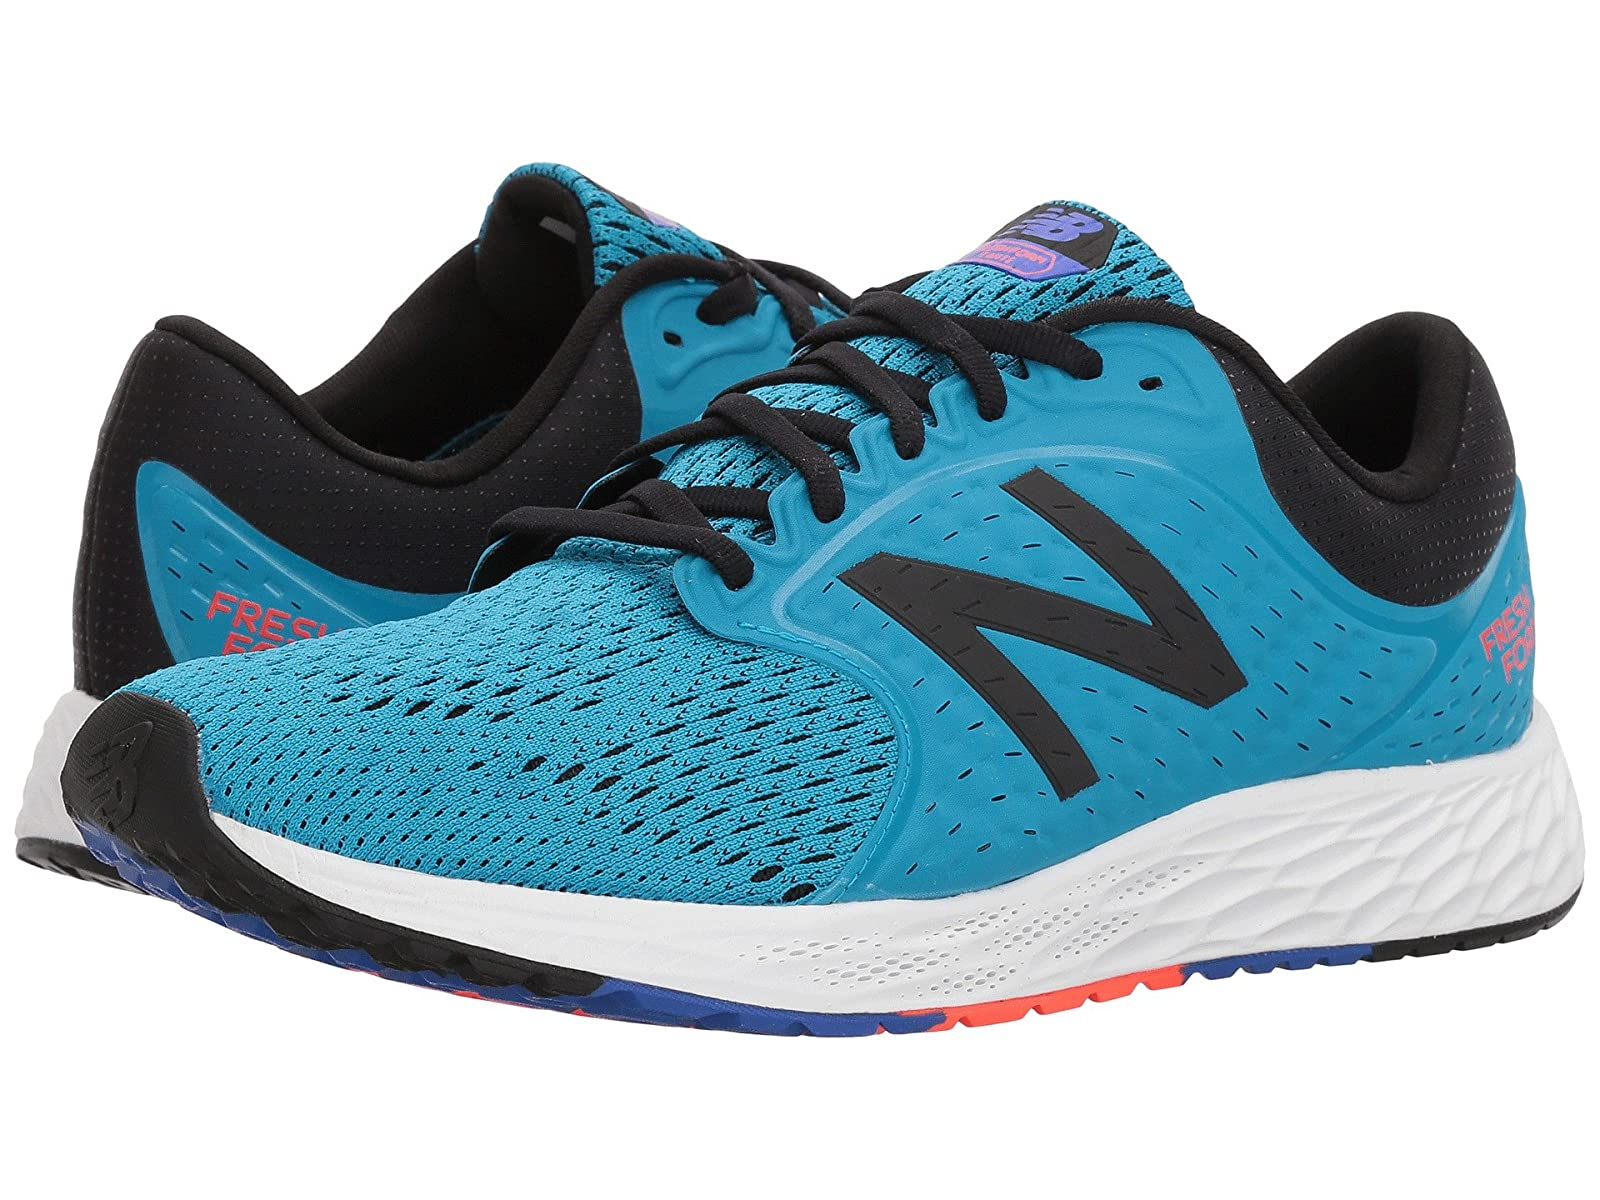 New Balance Fresh Foam Zante v4Atmospheric grades have affordable shoes